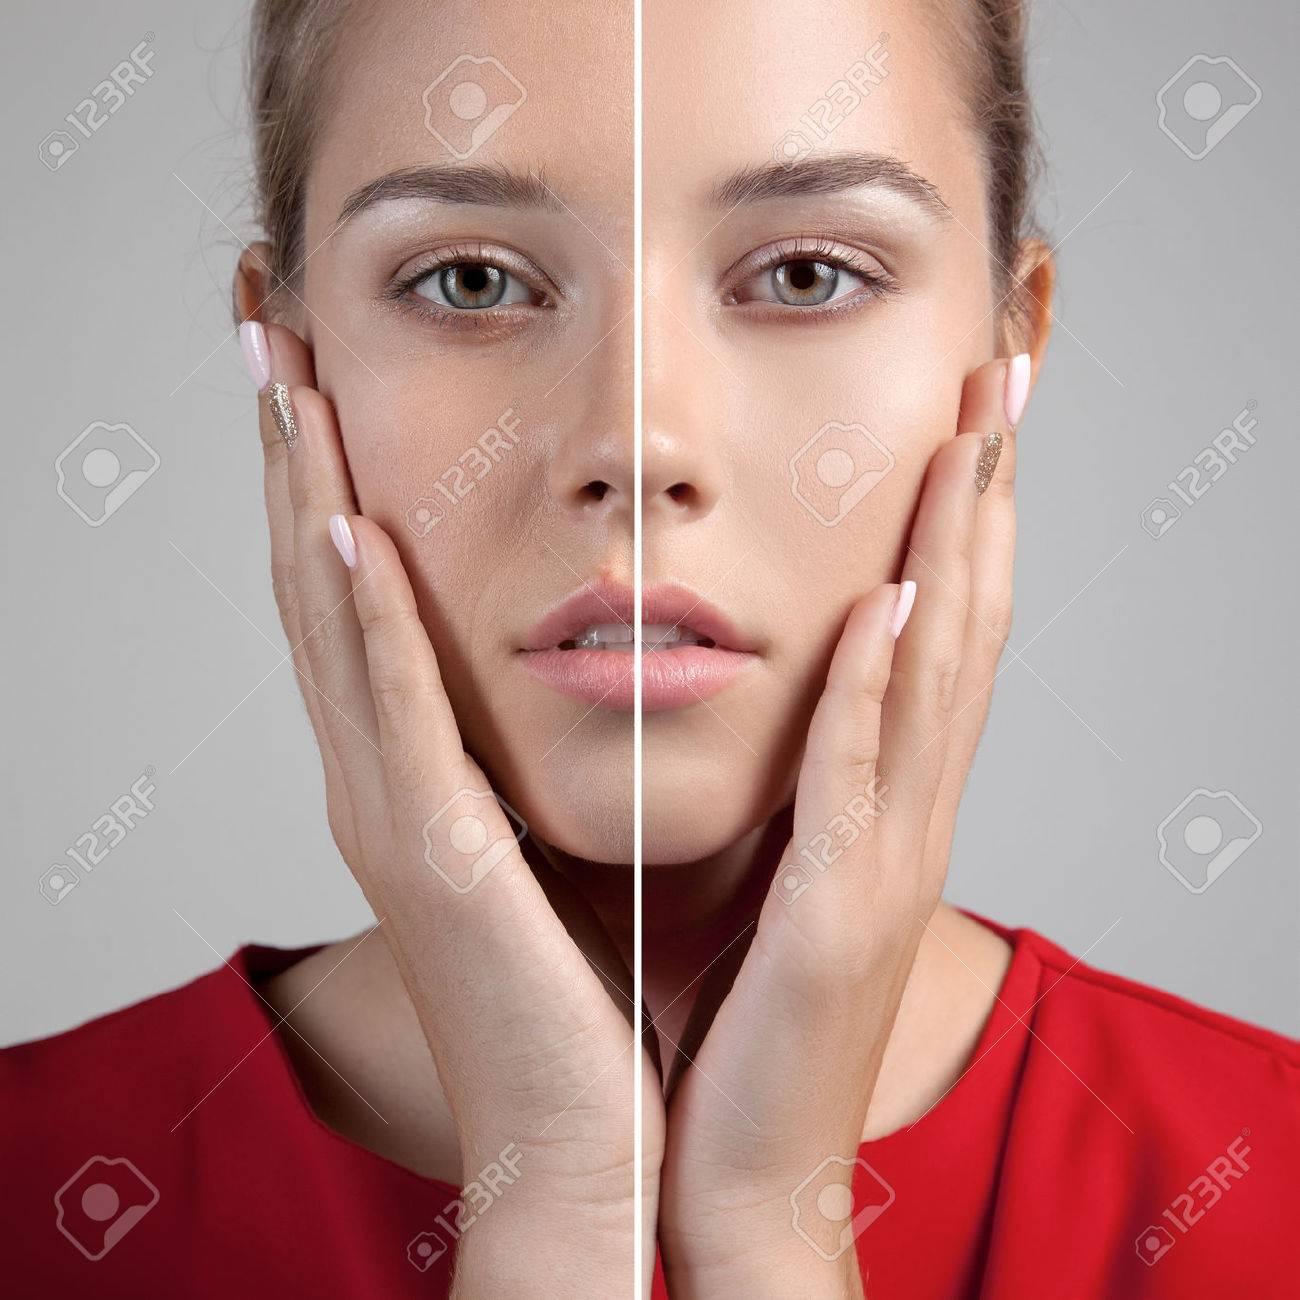 http://n3.datasn.io/data/api/v1/n3zm/image_of_skin_disease_5/main/skin_disease_image_download//c8/5d/11/69/c85d1169920795fa8b32bbfd9aaafbd9fd328b70.jpg